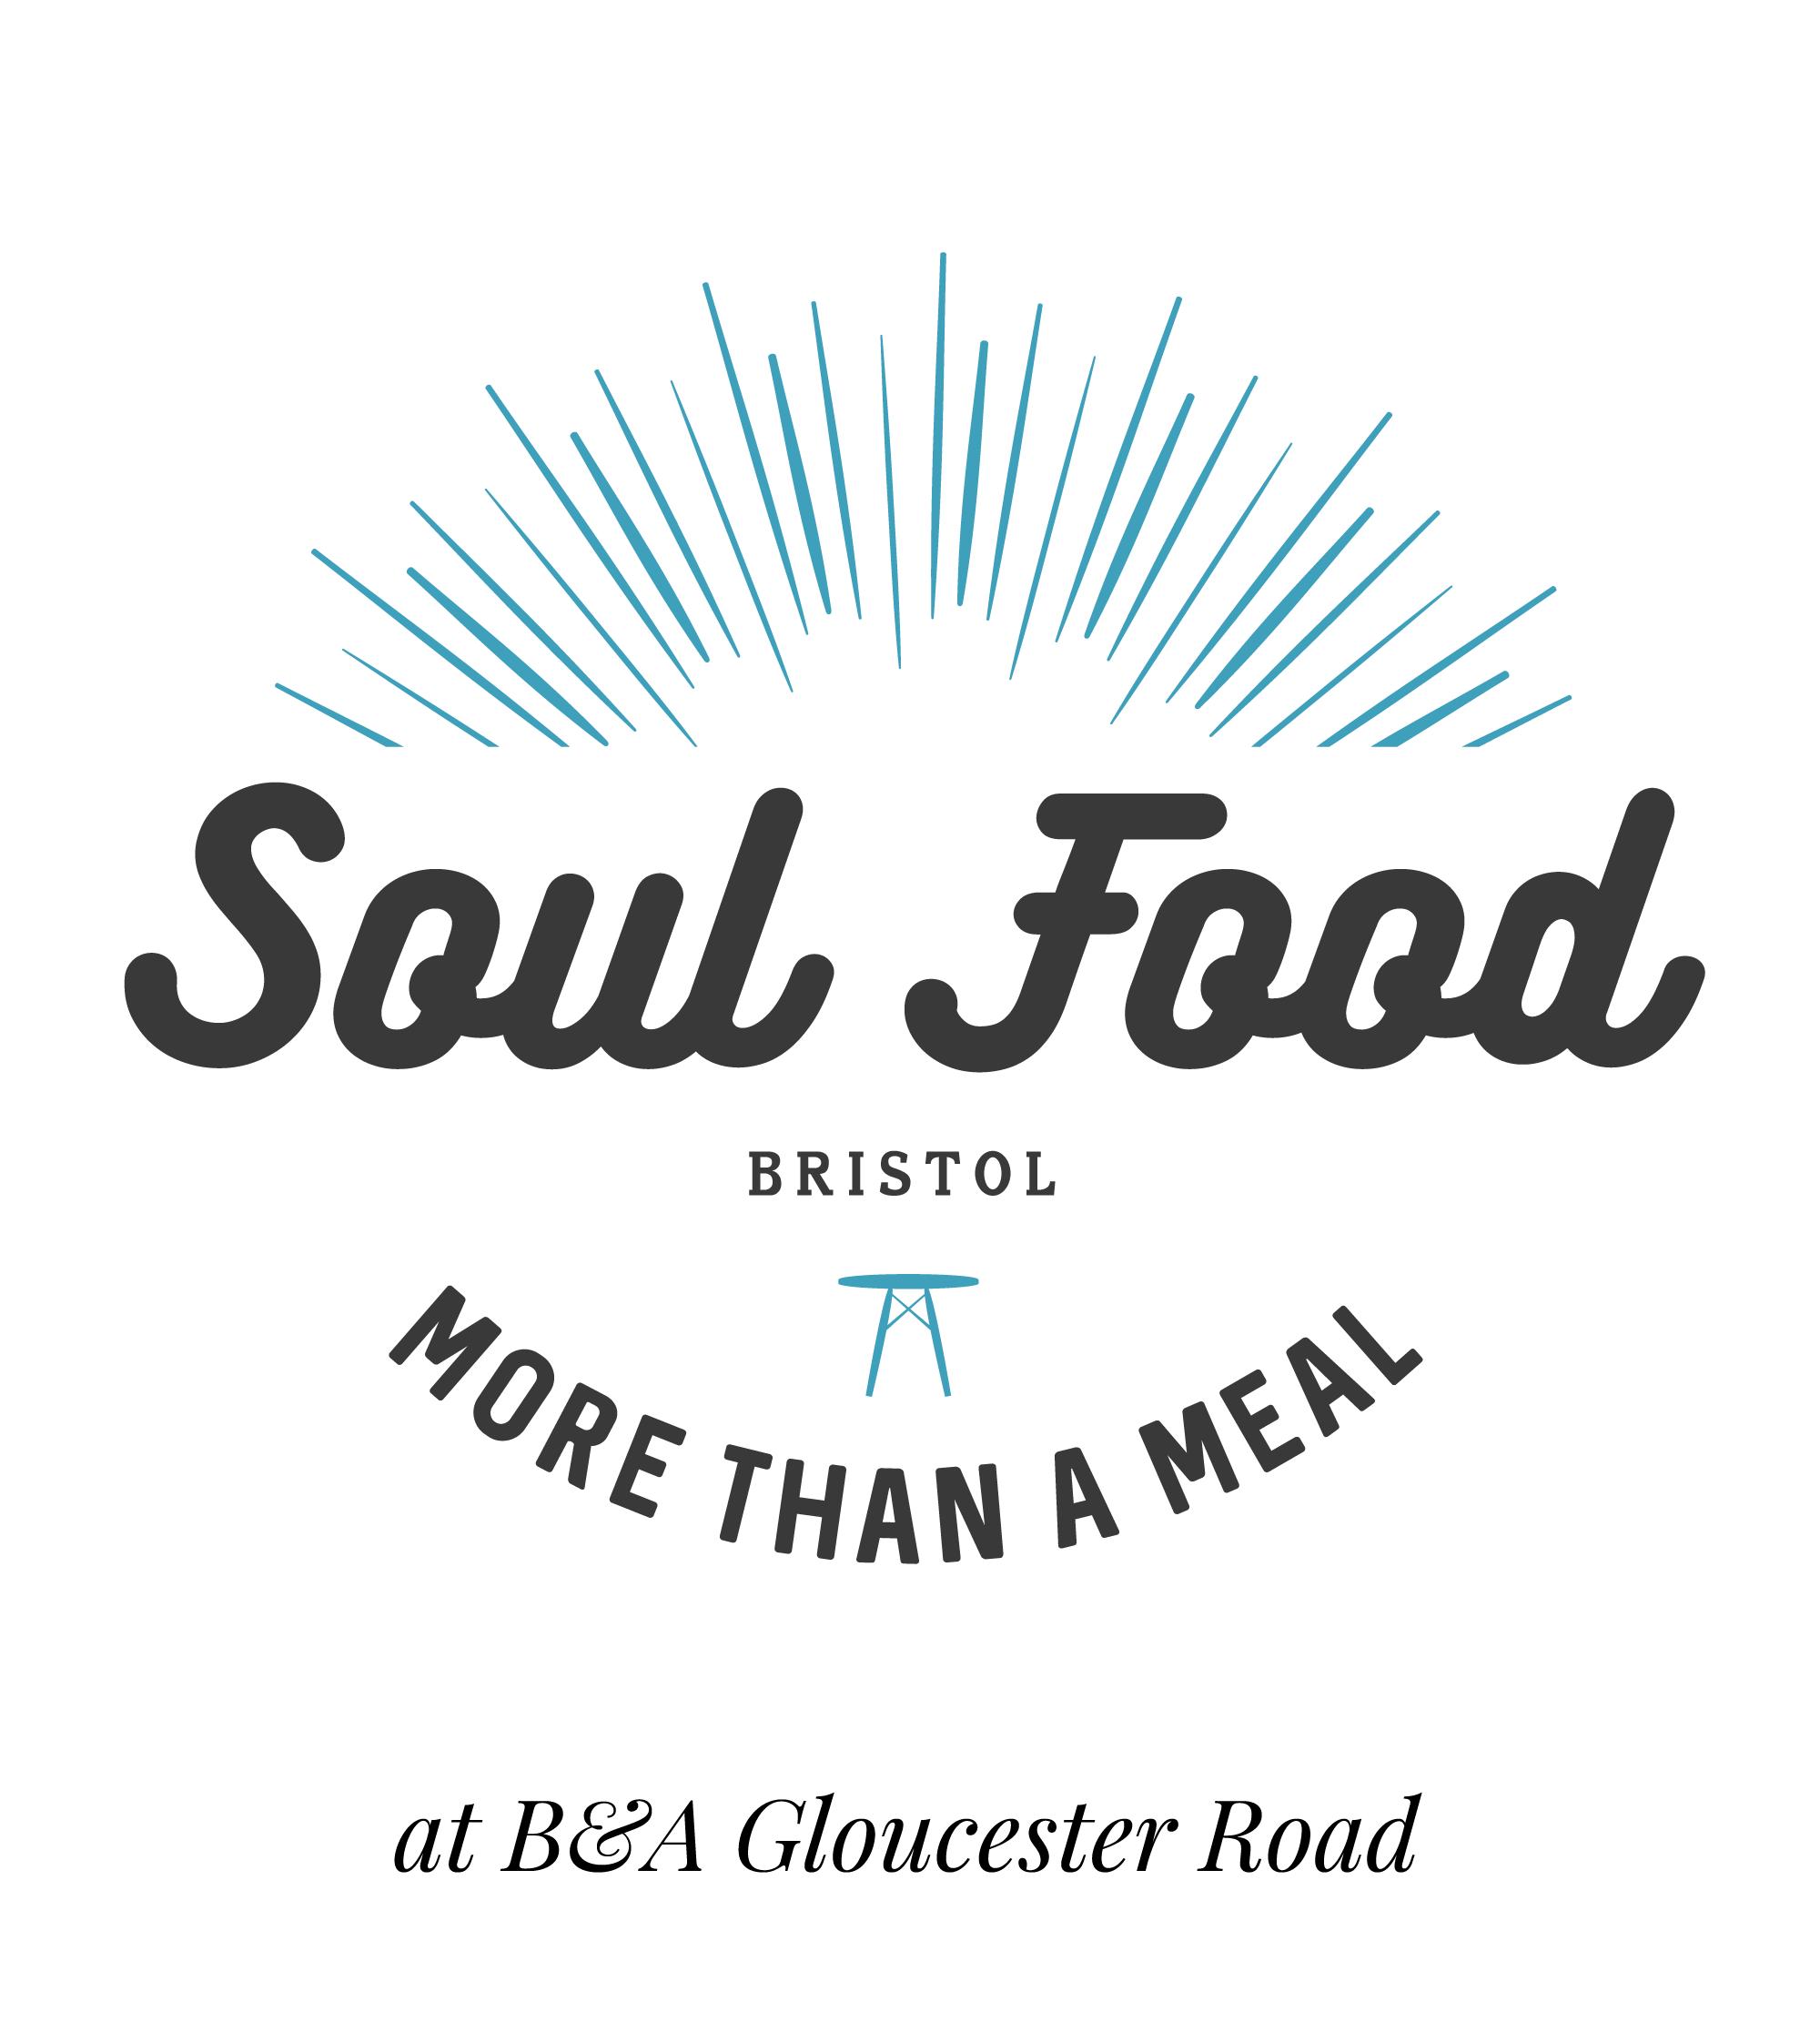 Soul-Food-B&A-Gloucester-Rd-logo.png